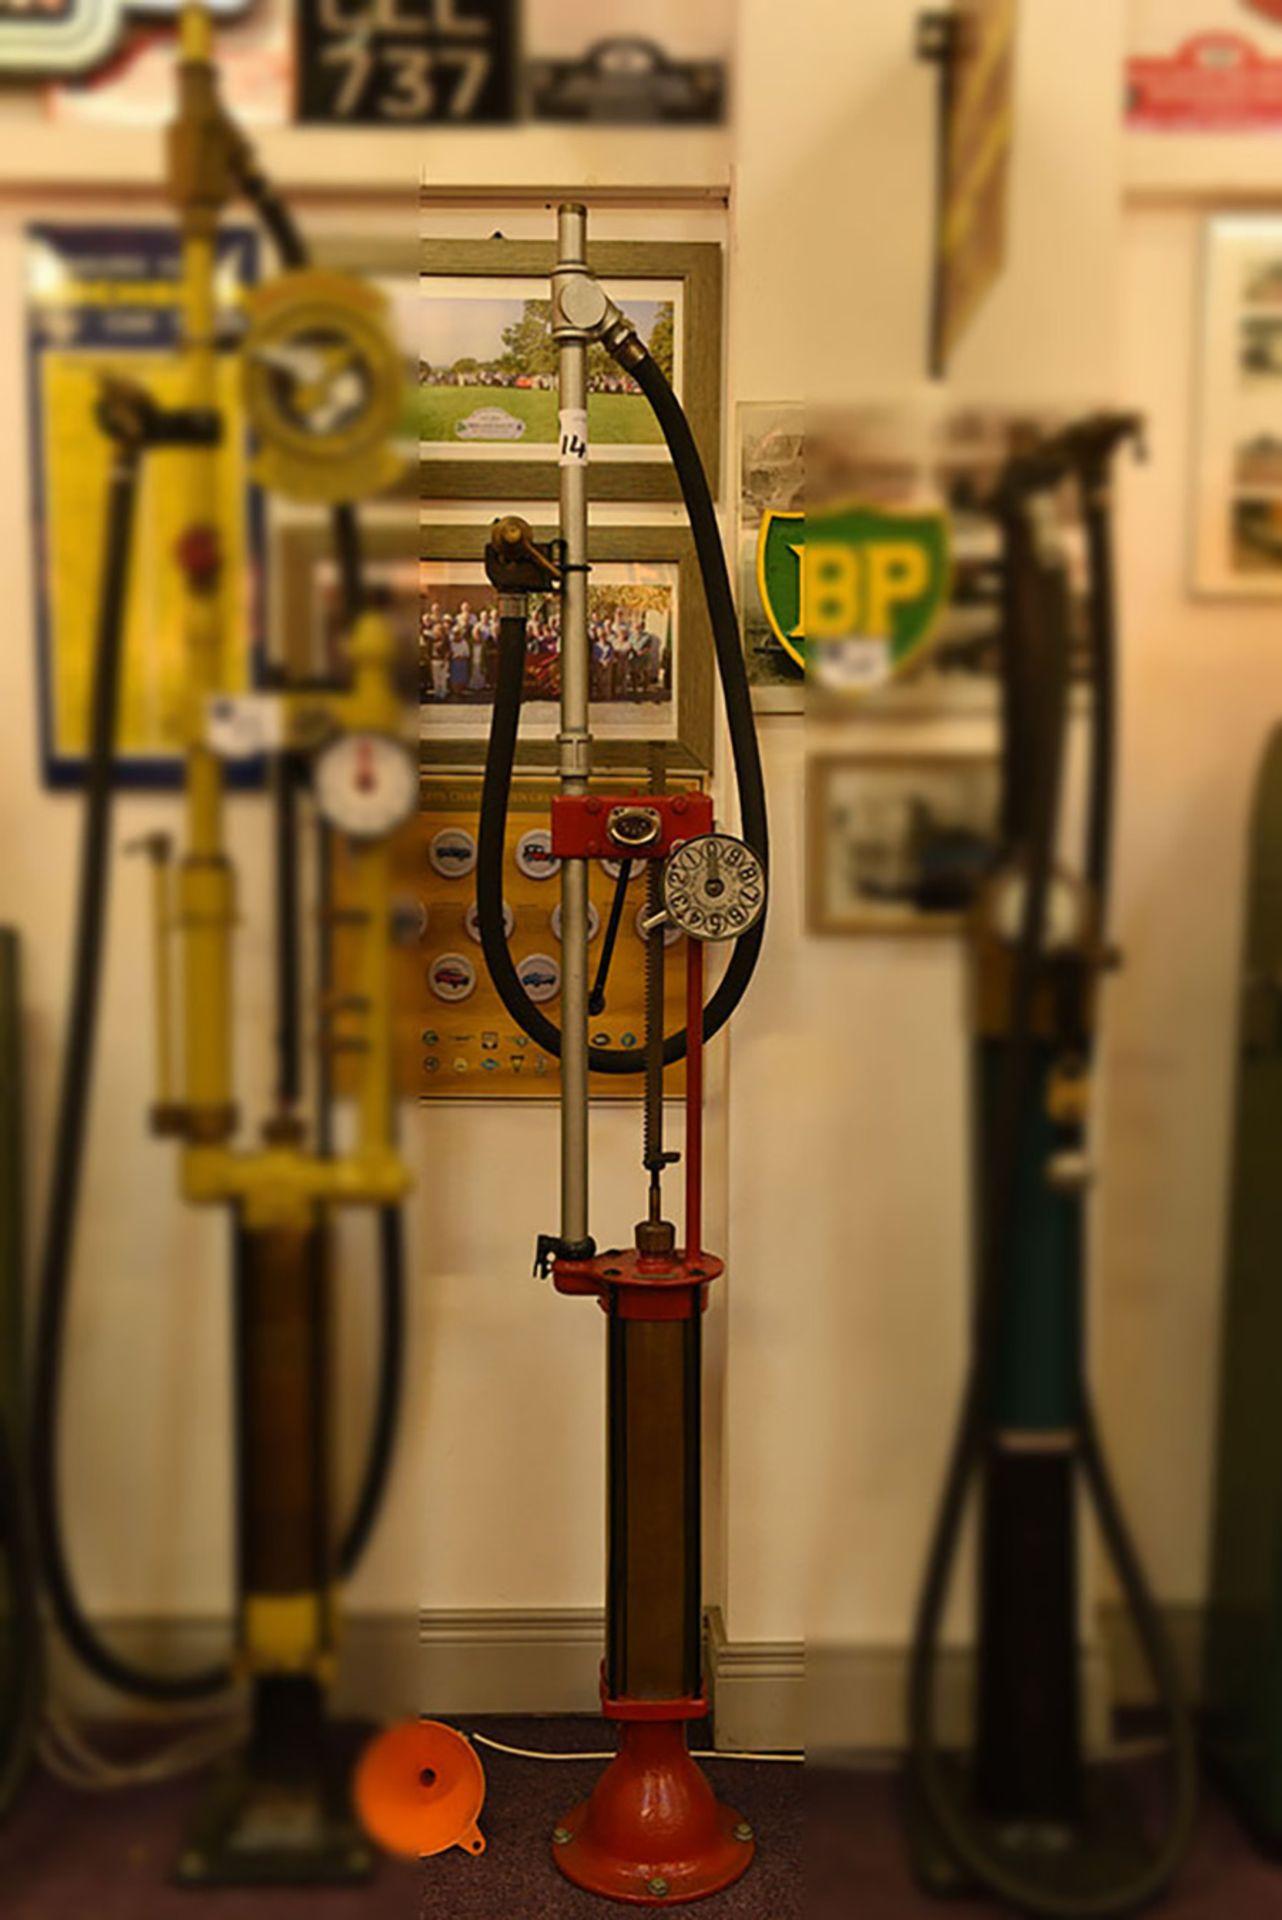 Lot 14 - Free standing petrol pump